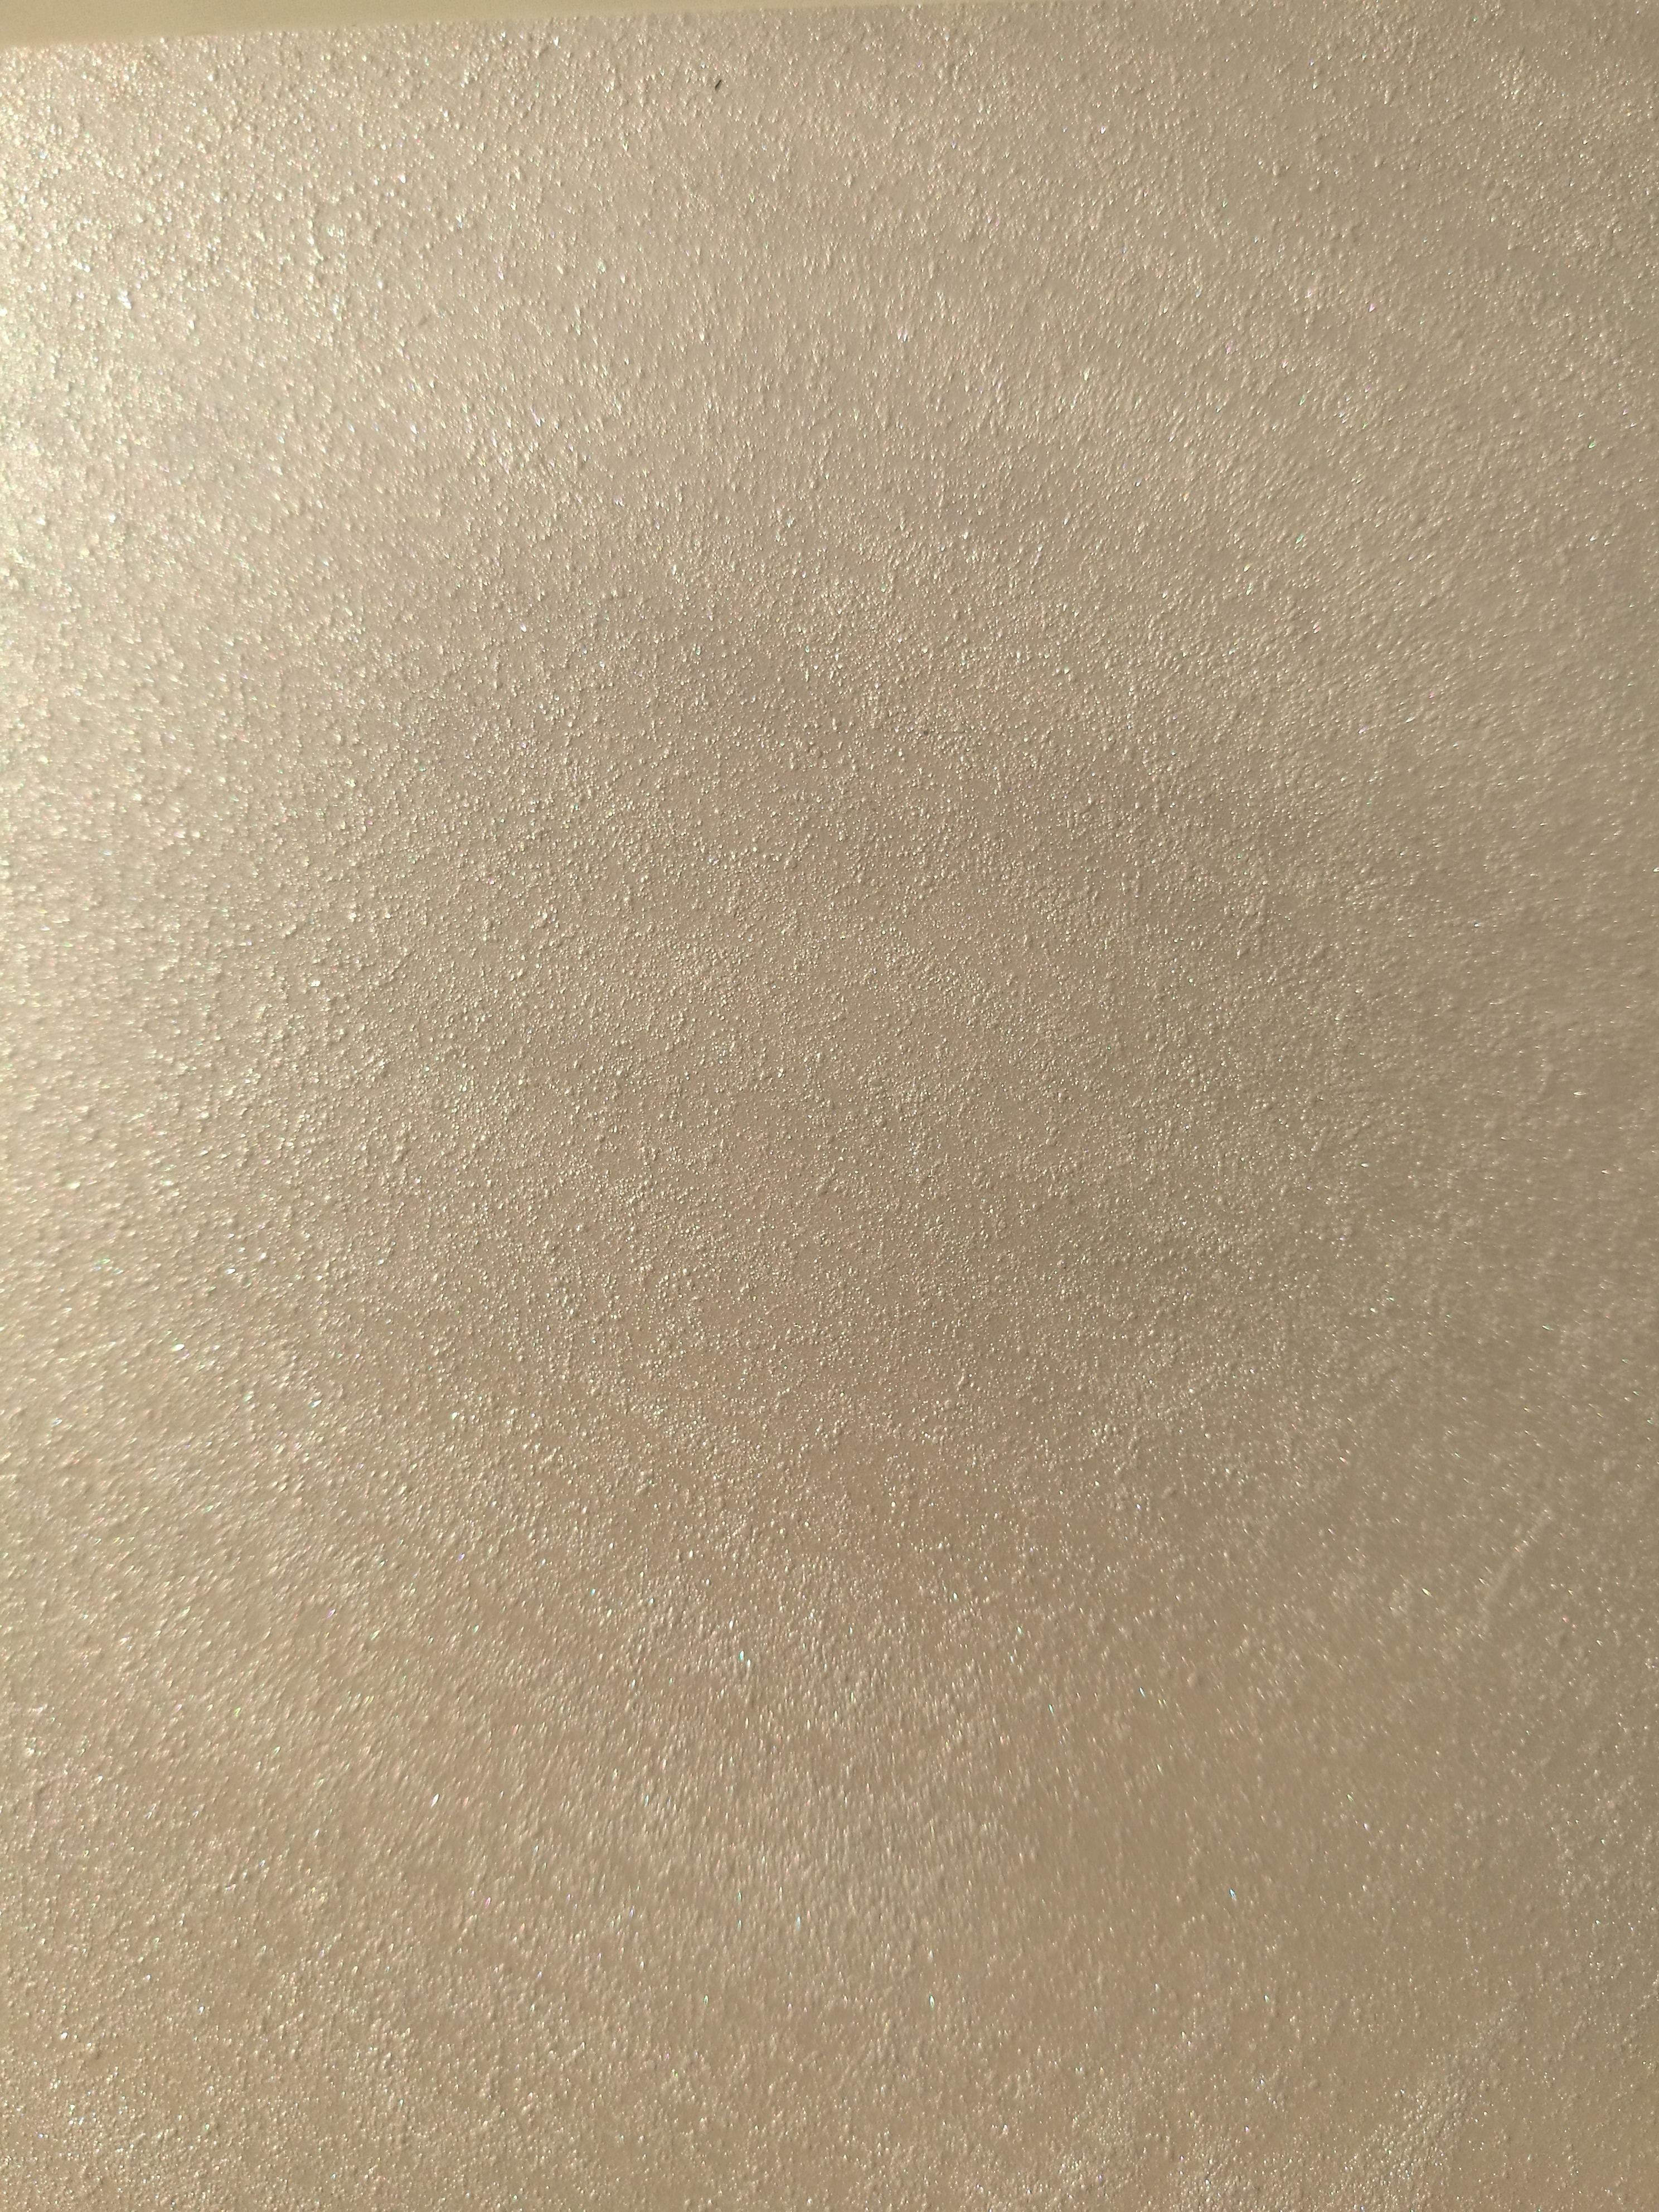 graesan graesan white paint 1 lt pittura decorativa bianca perlescente